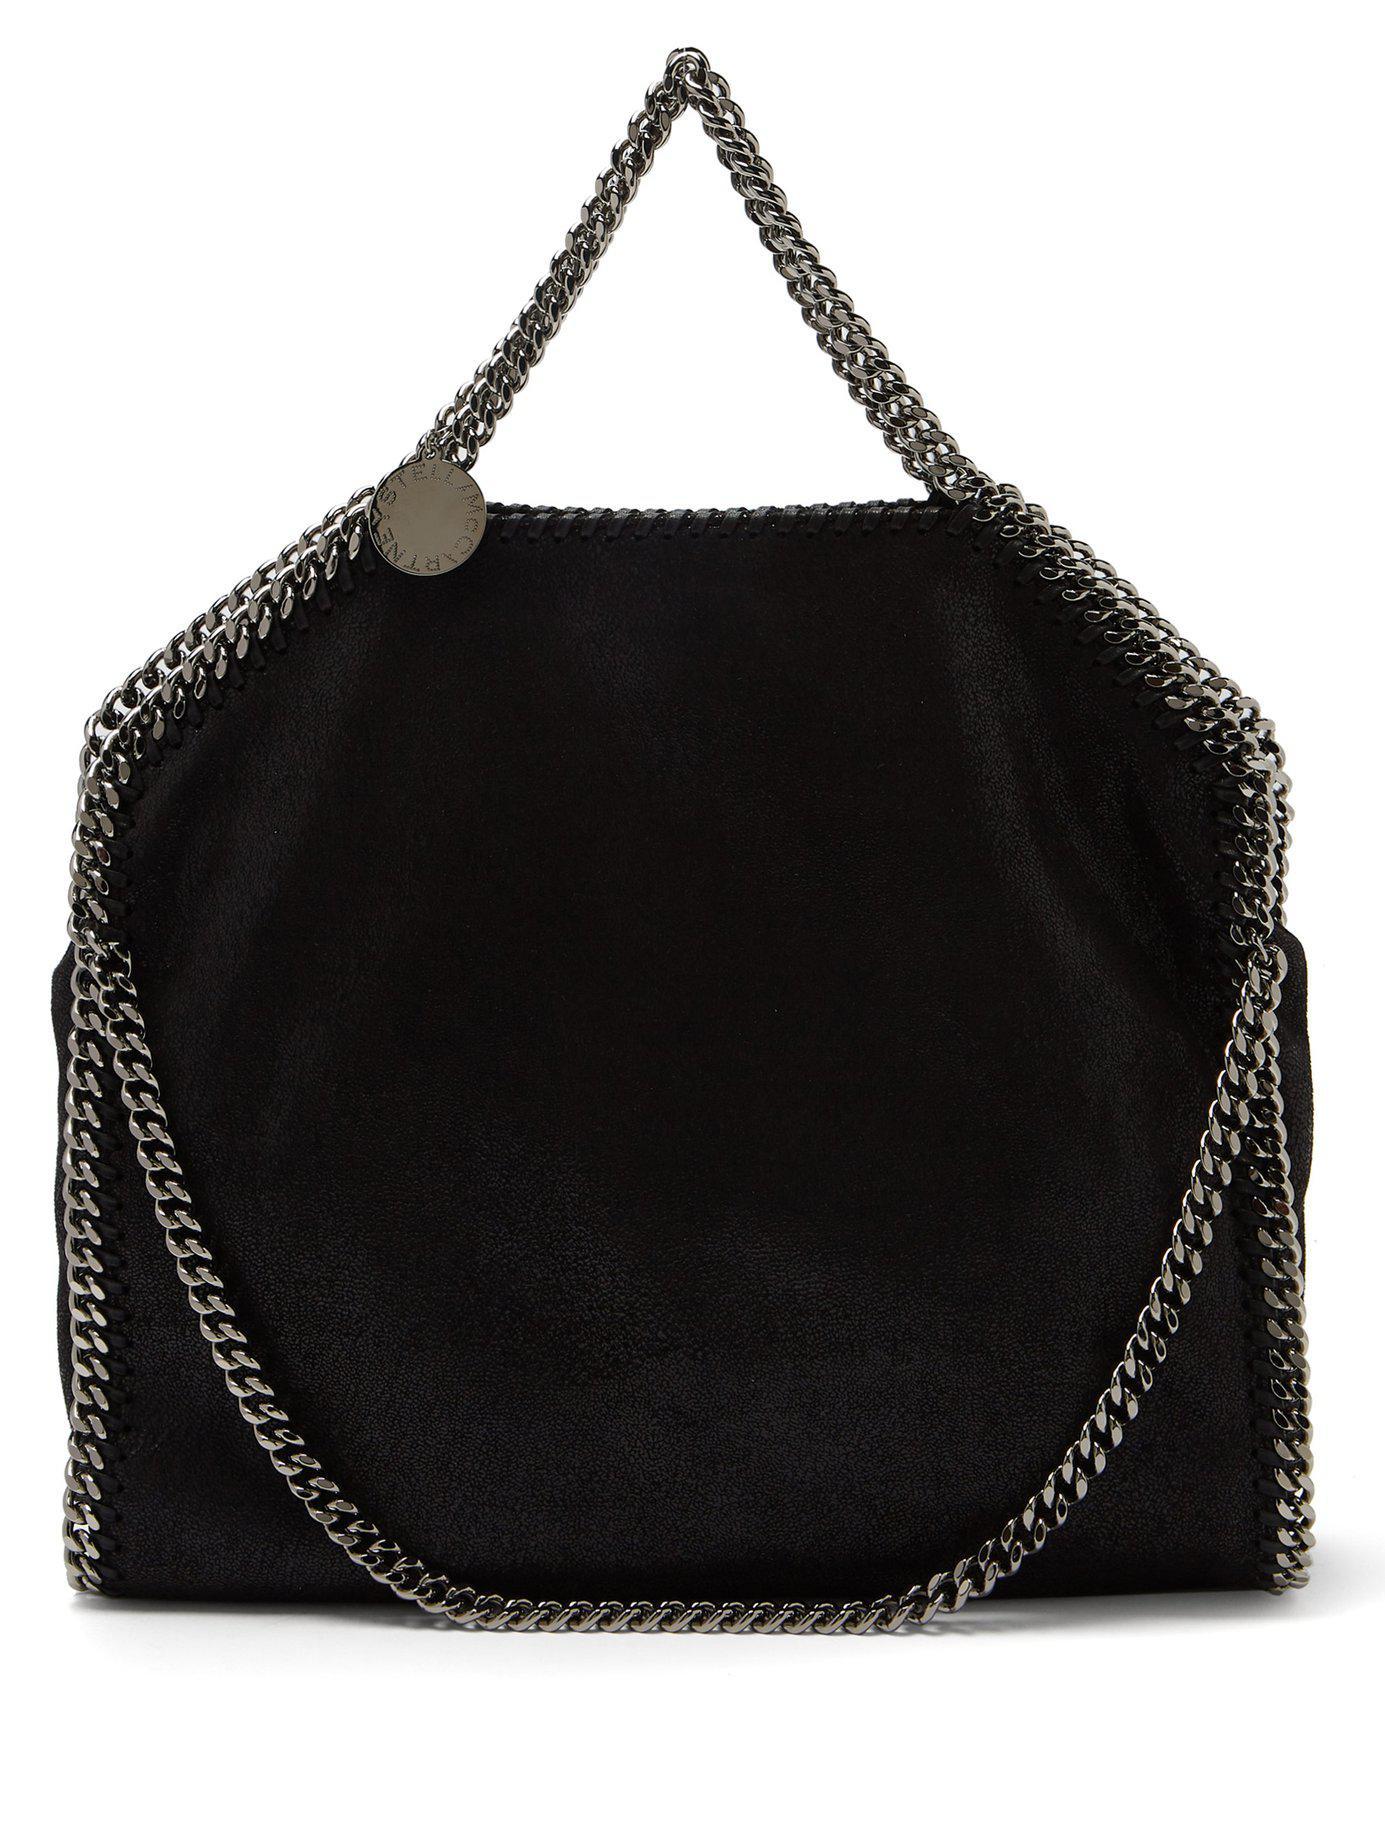 Lyst - Stella McCartney Falabella Faux Suede Shoulder Bag in Black a387b0500d203